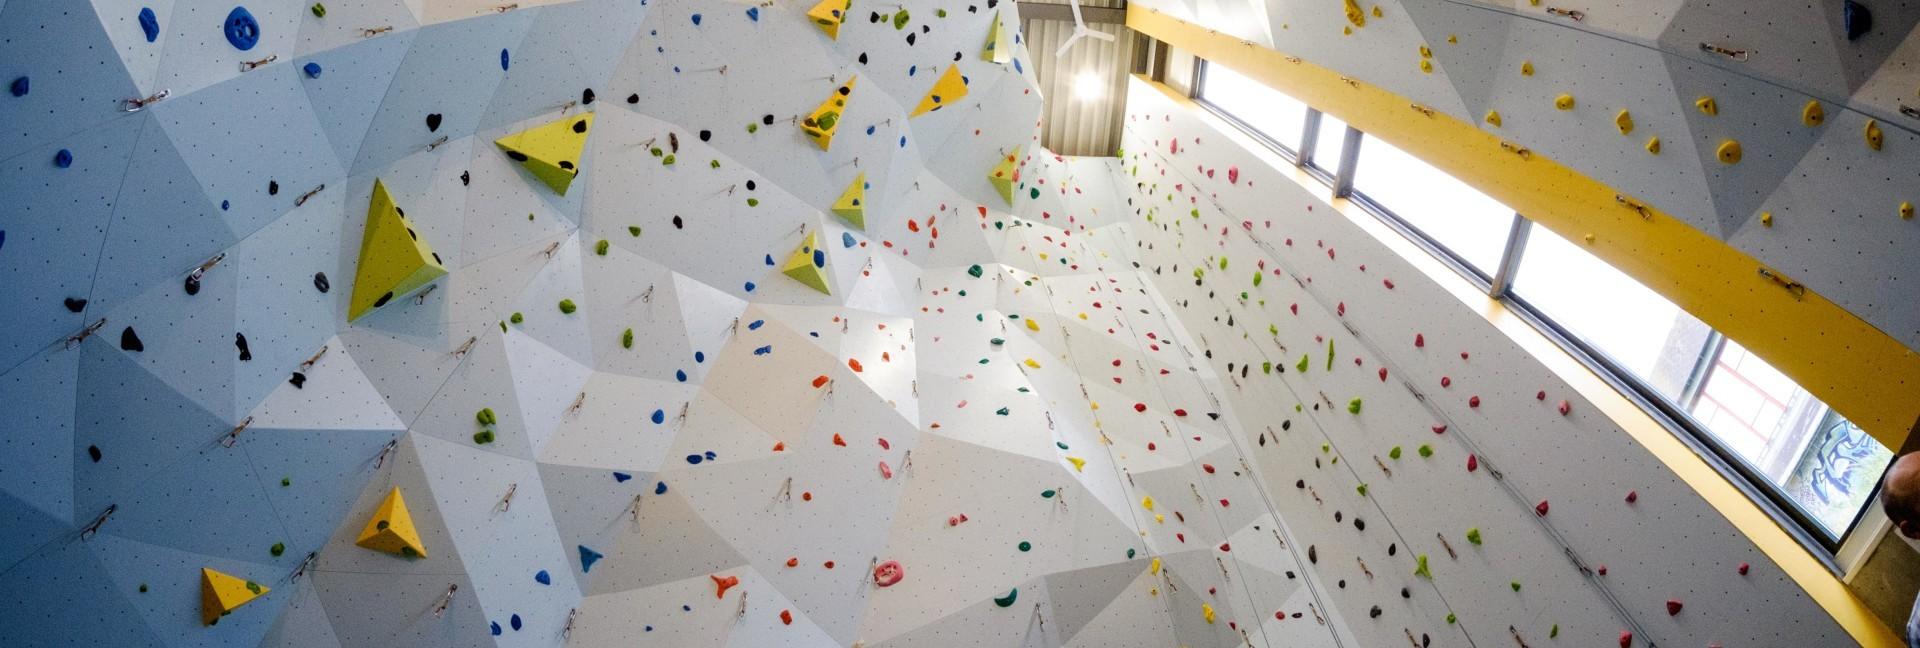 Prøv Haugalandsveggens klatreskole i sommer!